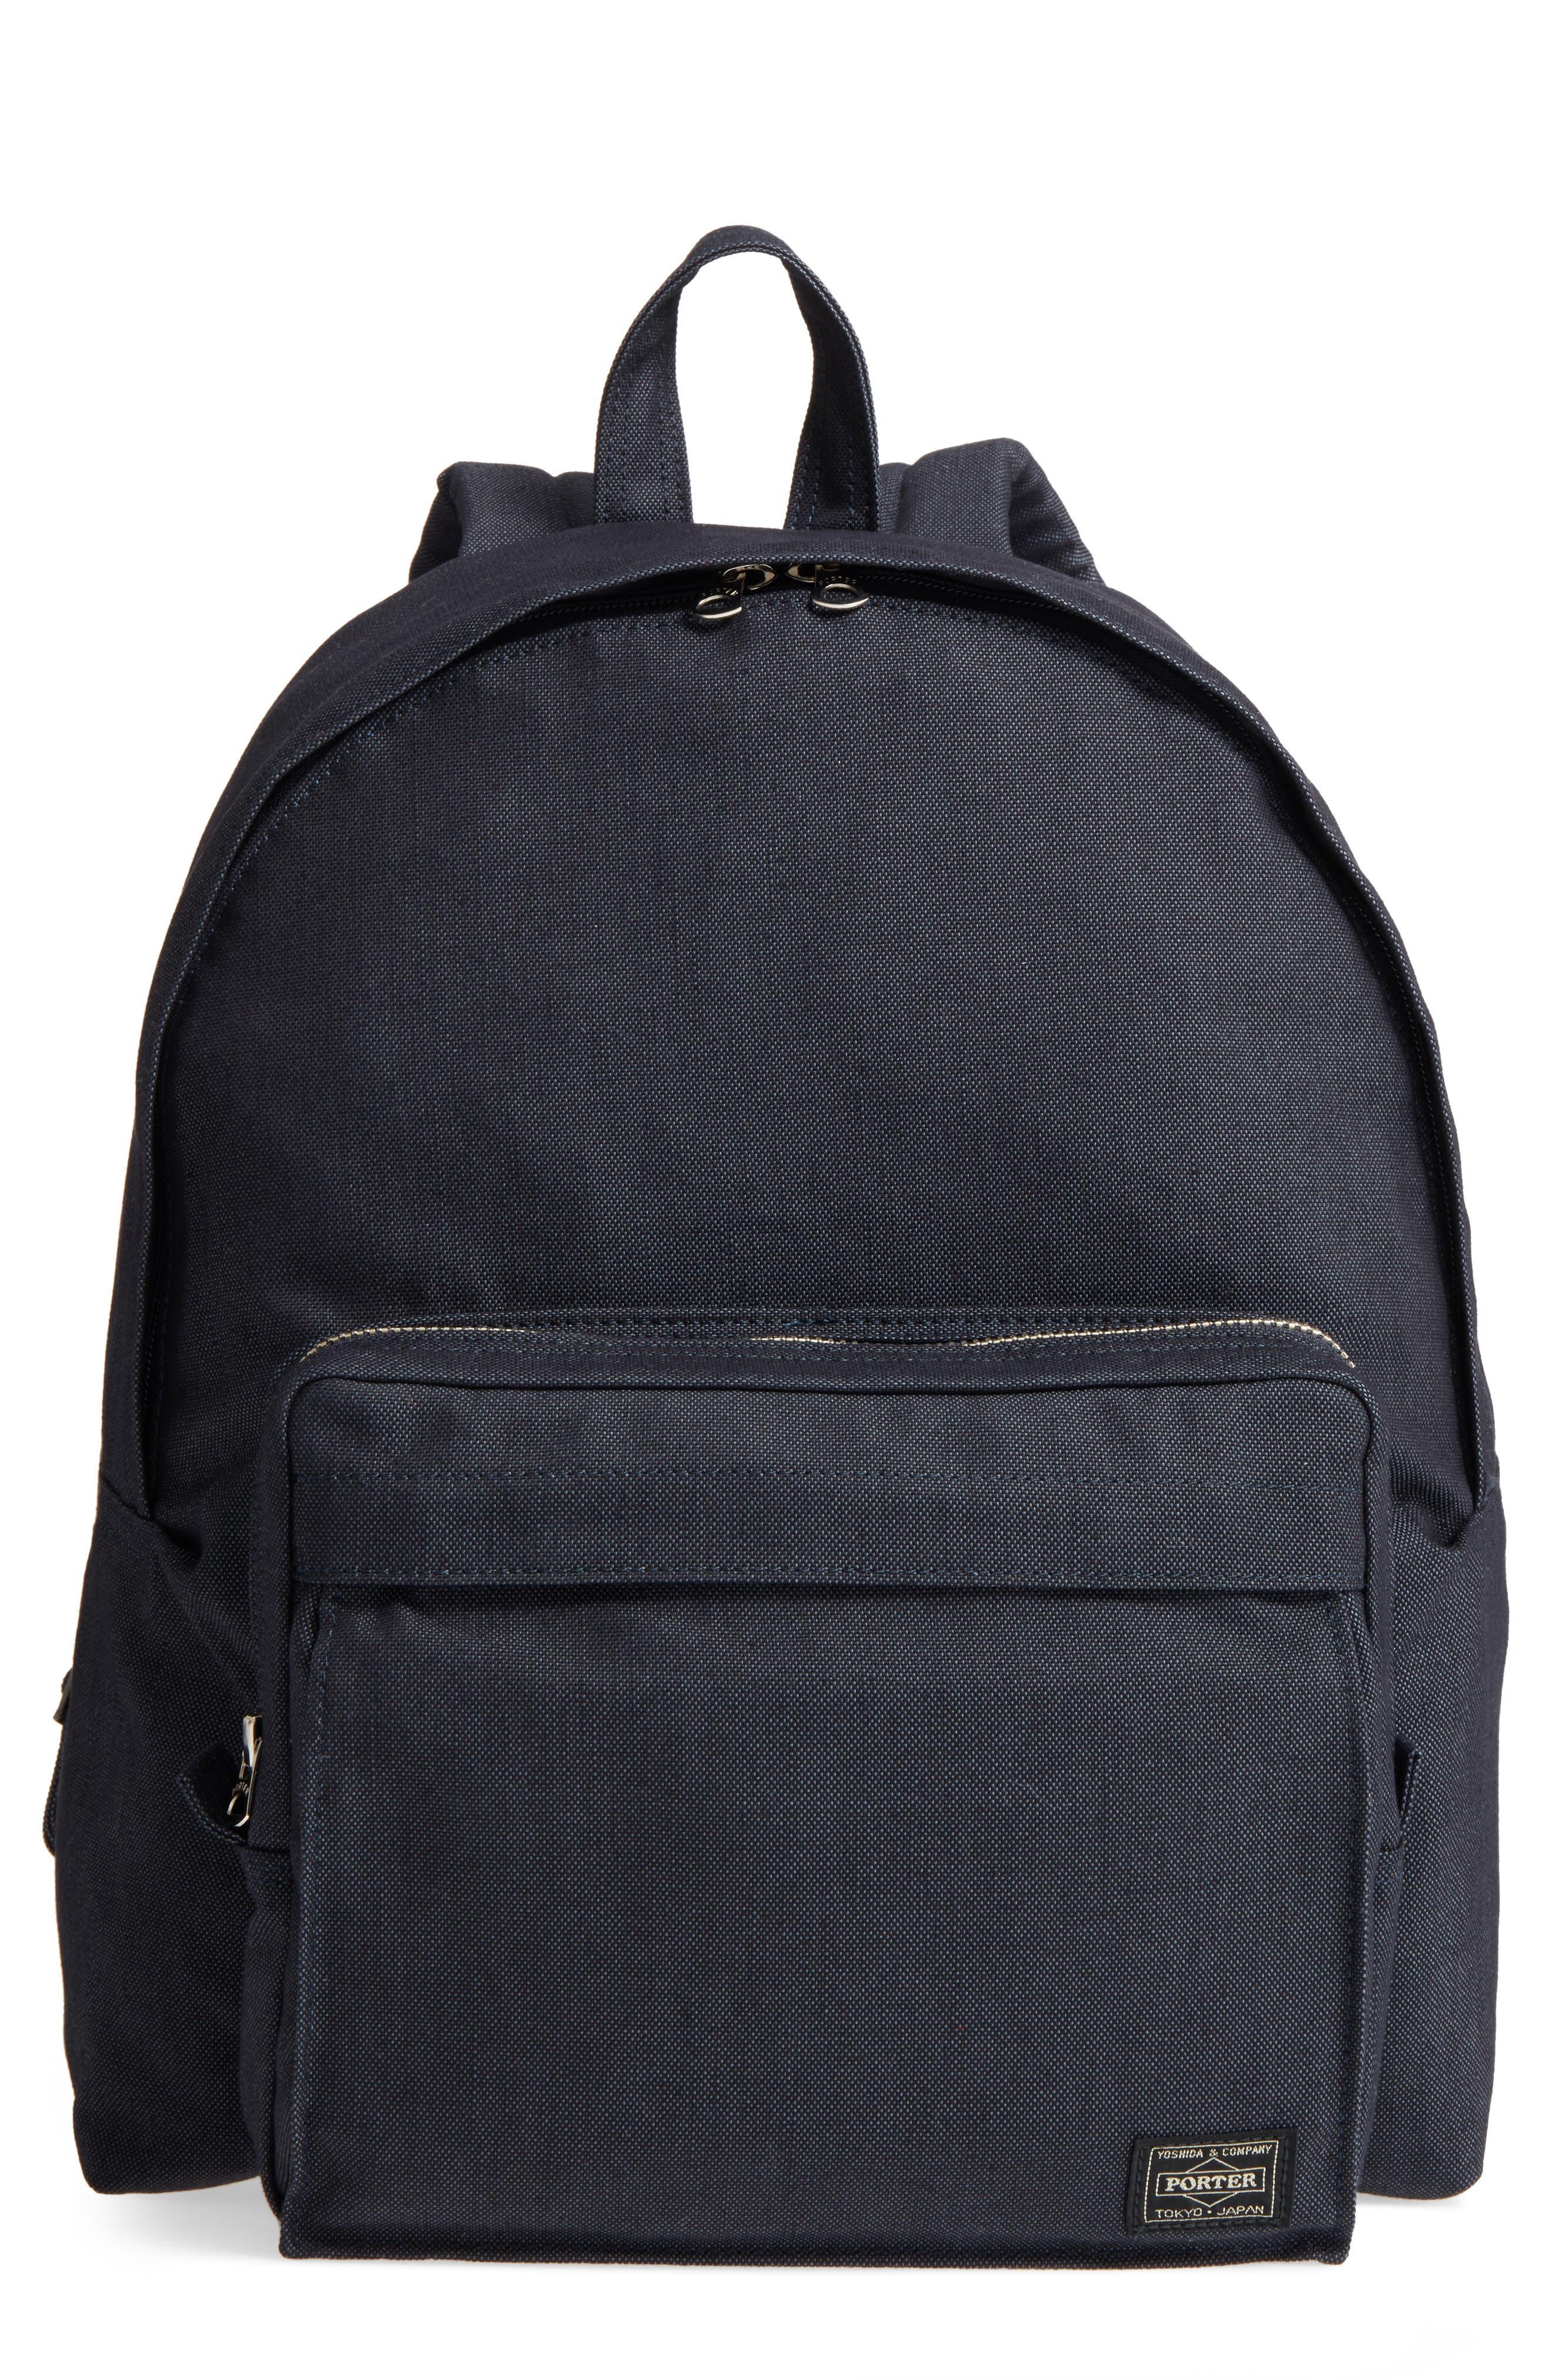 Porter-Yoshida & Co. Smoky Backpack,                             Main thumbnail 1, color,                             400